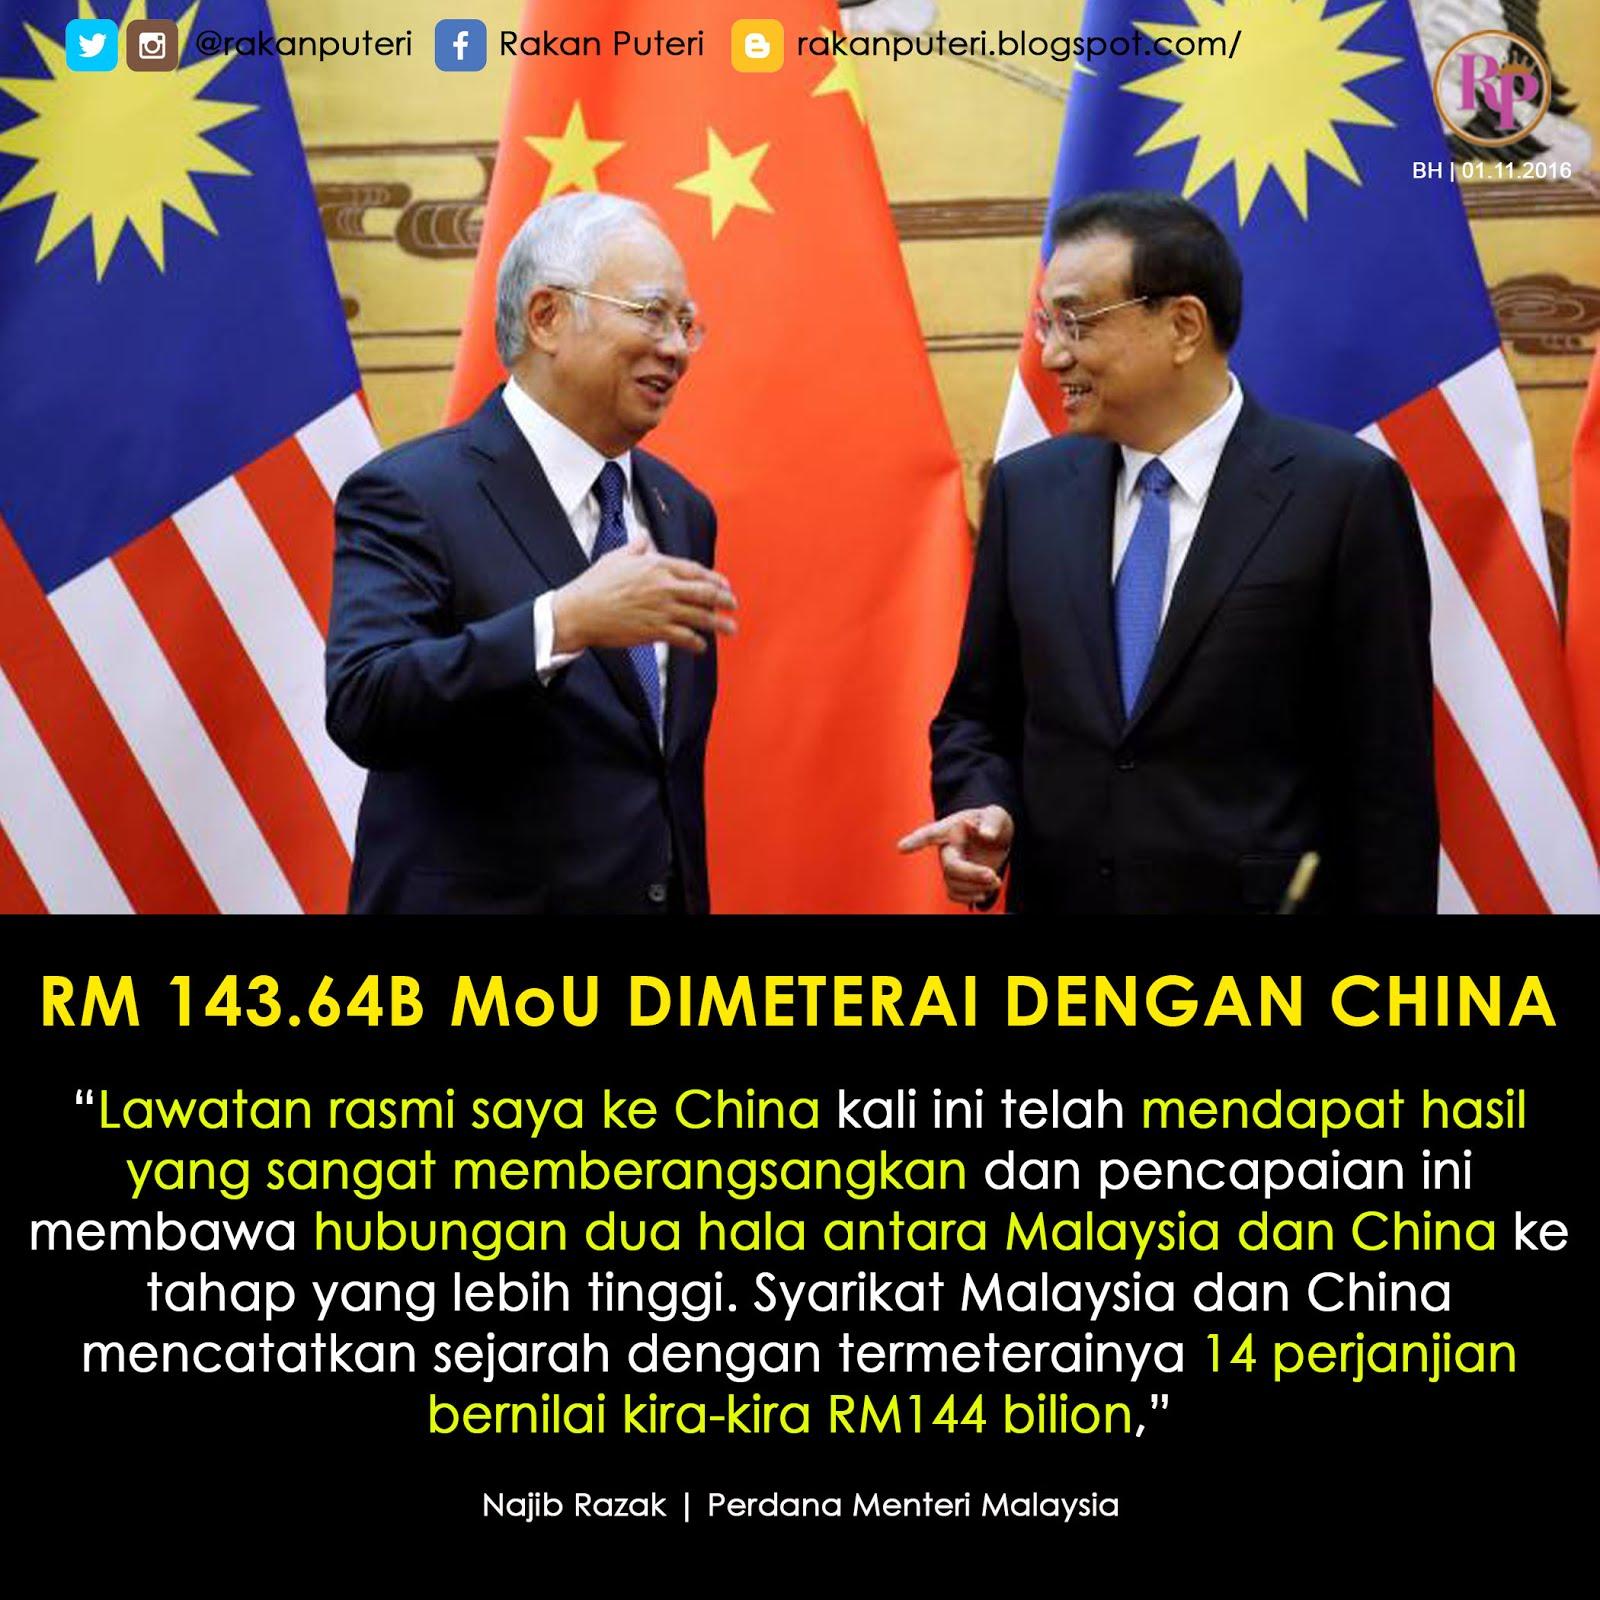 Najib Trial China Bailout 1mdb Debt Is Real